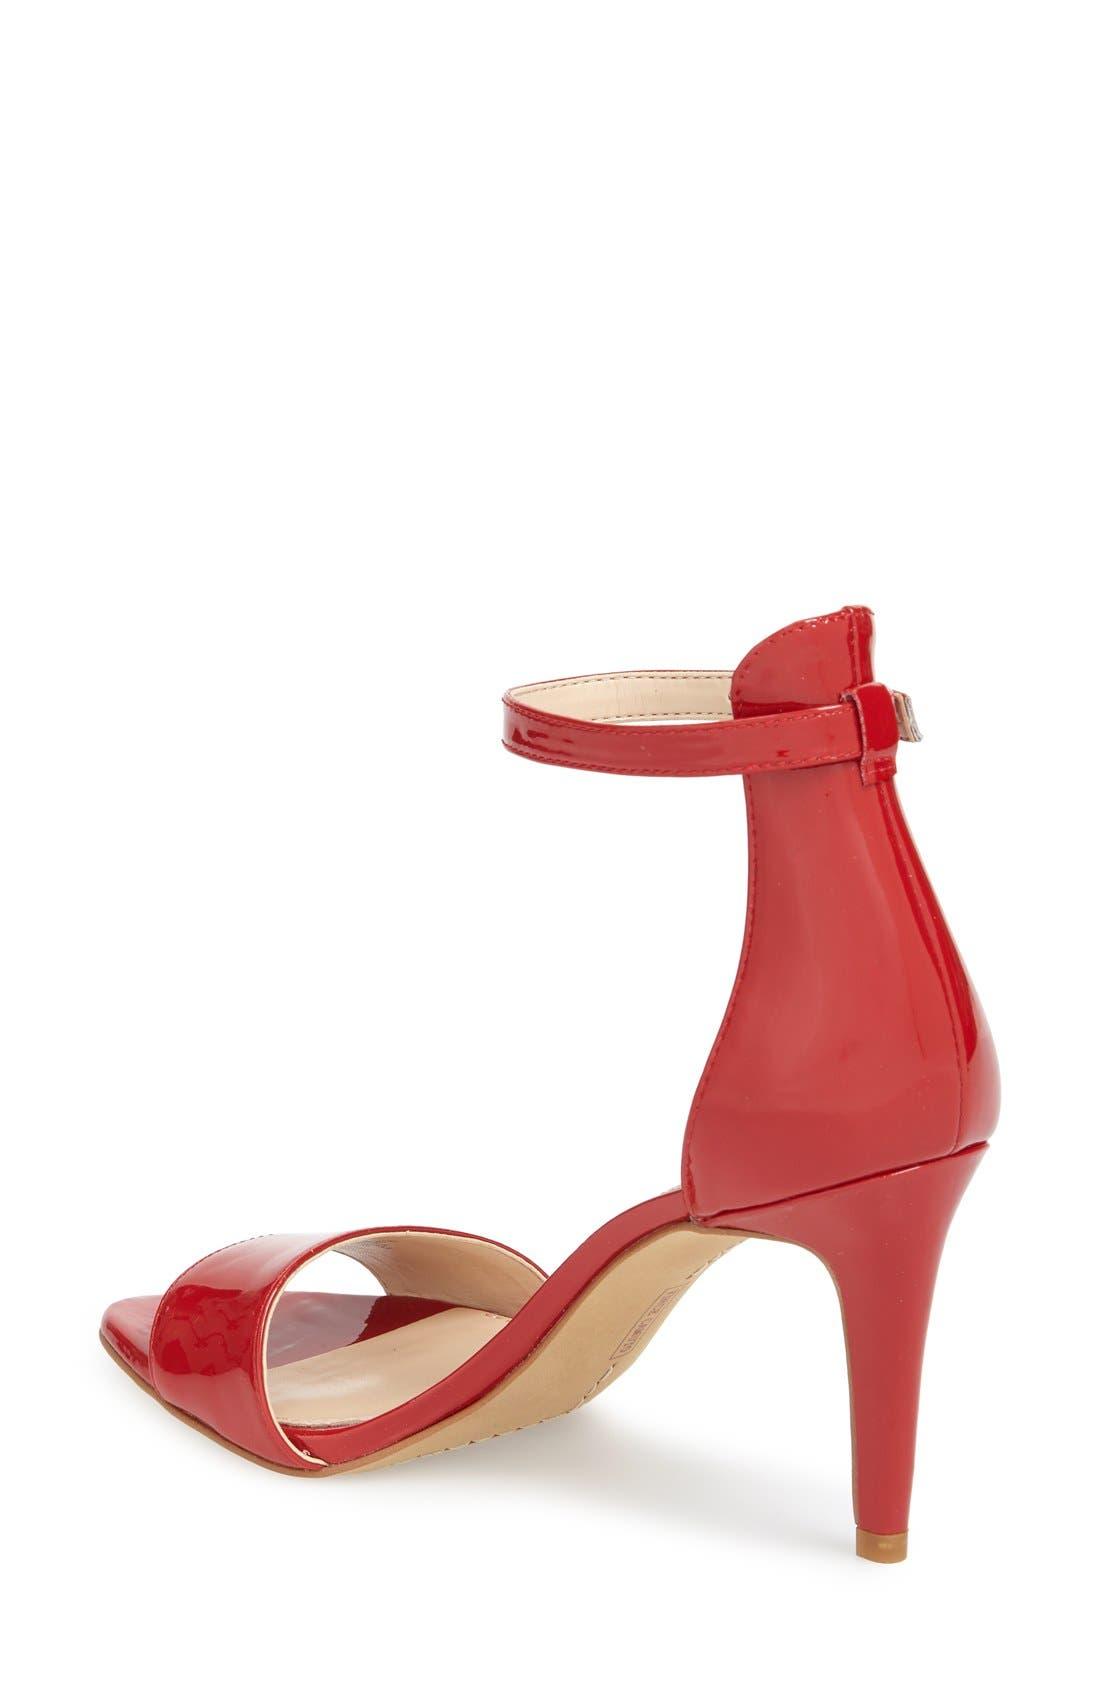 ,                             'Court' Ankle Strap Sandal,                             Alternate thumbnail 88, color,                             640